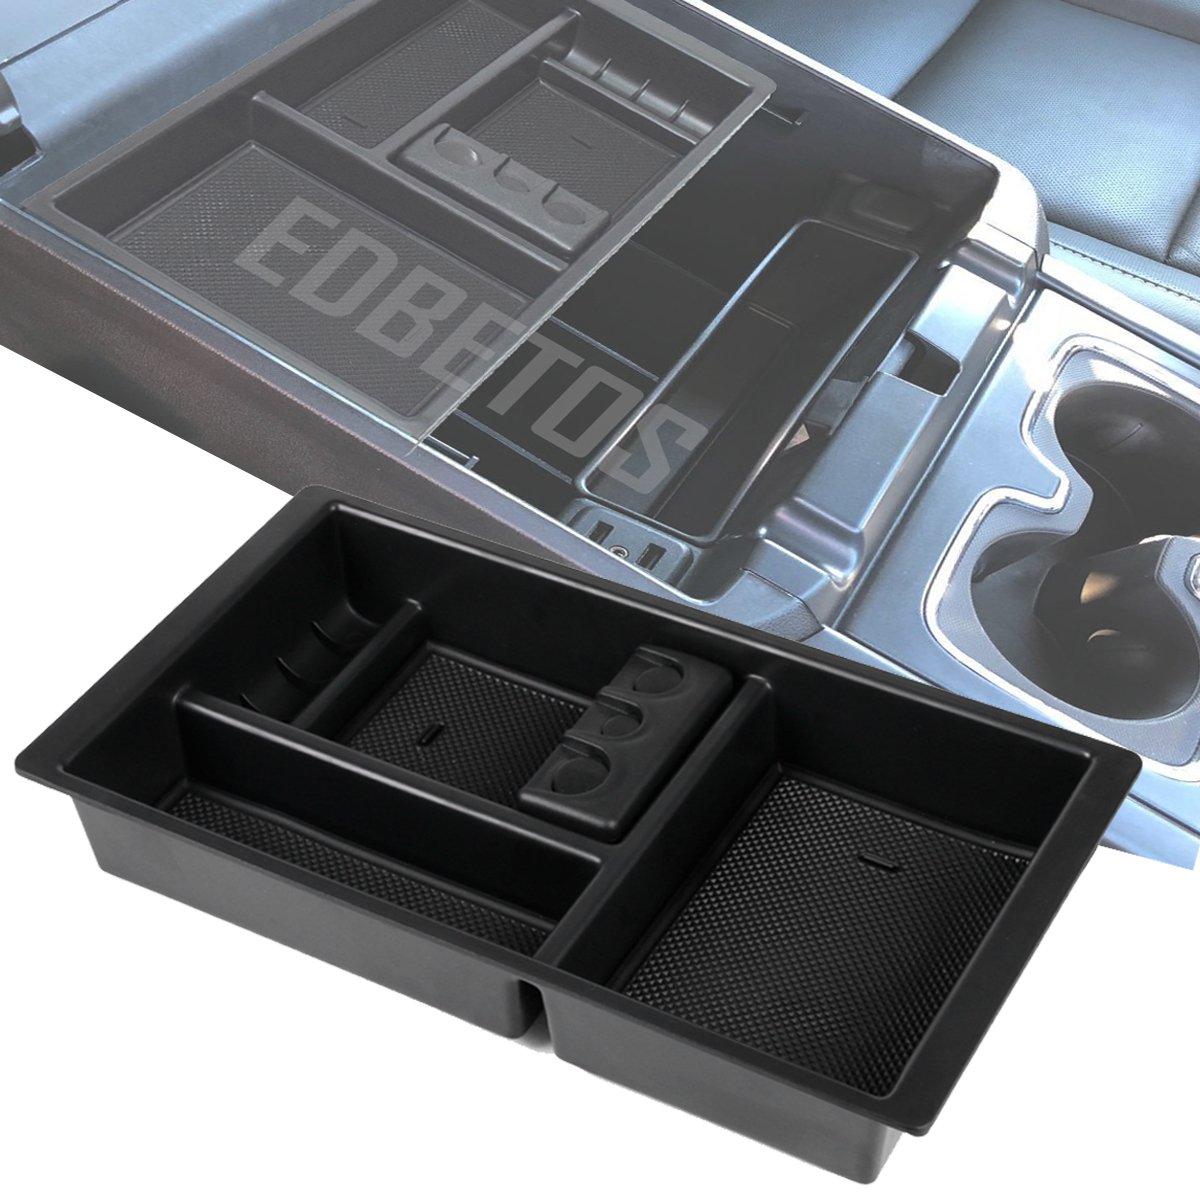 EDBETOS Center Console Organizer Tray for Chevy Silverado GMC Sierra Yukon (2015-2018)-GM Vehicles Accessories Replaces 22817343 (Full Console w/Bucket Seats ONLY)